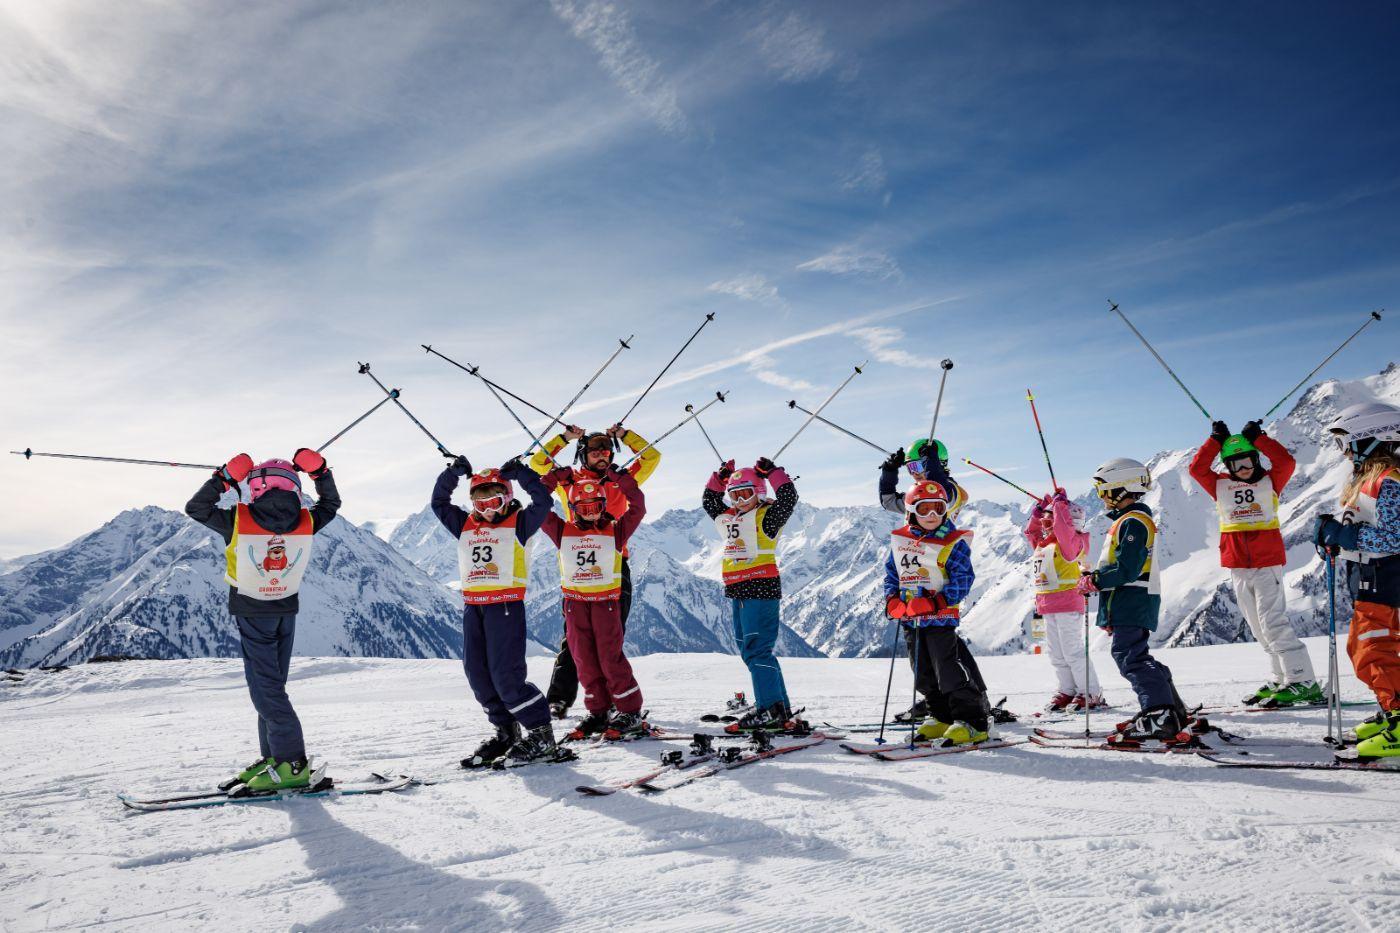 Kids Ski Lessons (4-14 y.) for Advanced Skiers